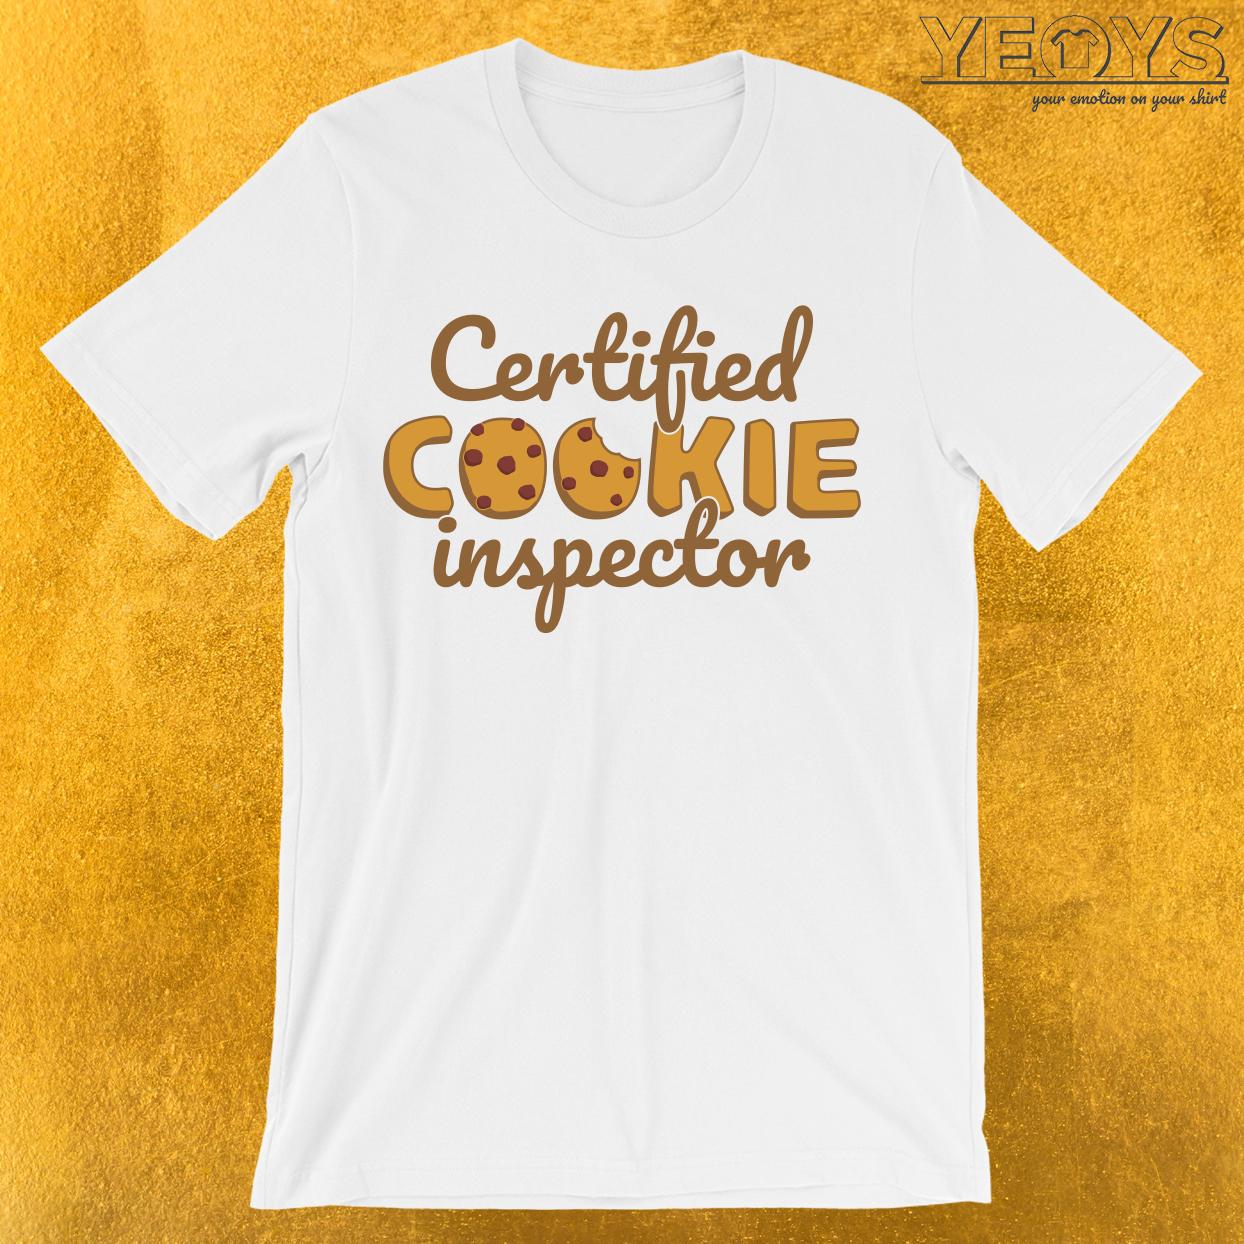 Certified Cookie Inspector T-Shirt